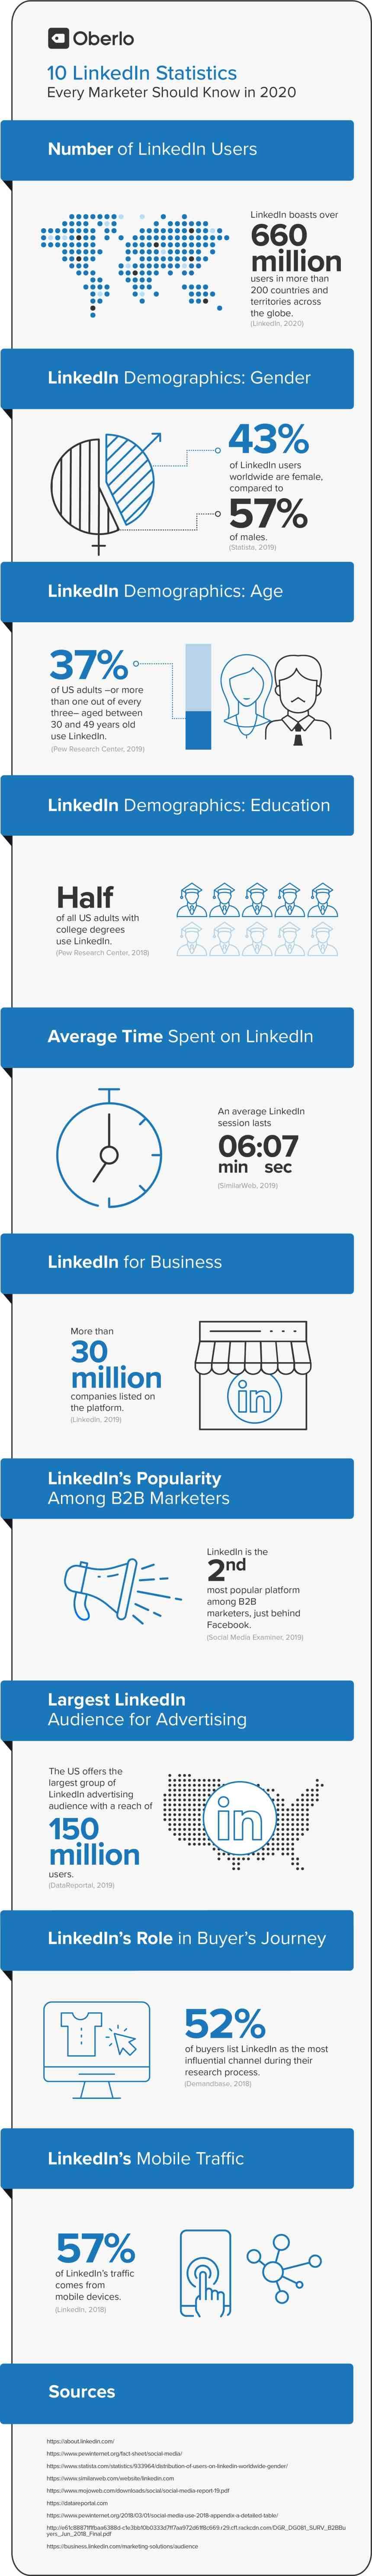 10 estadísticas sobre LinkedIn